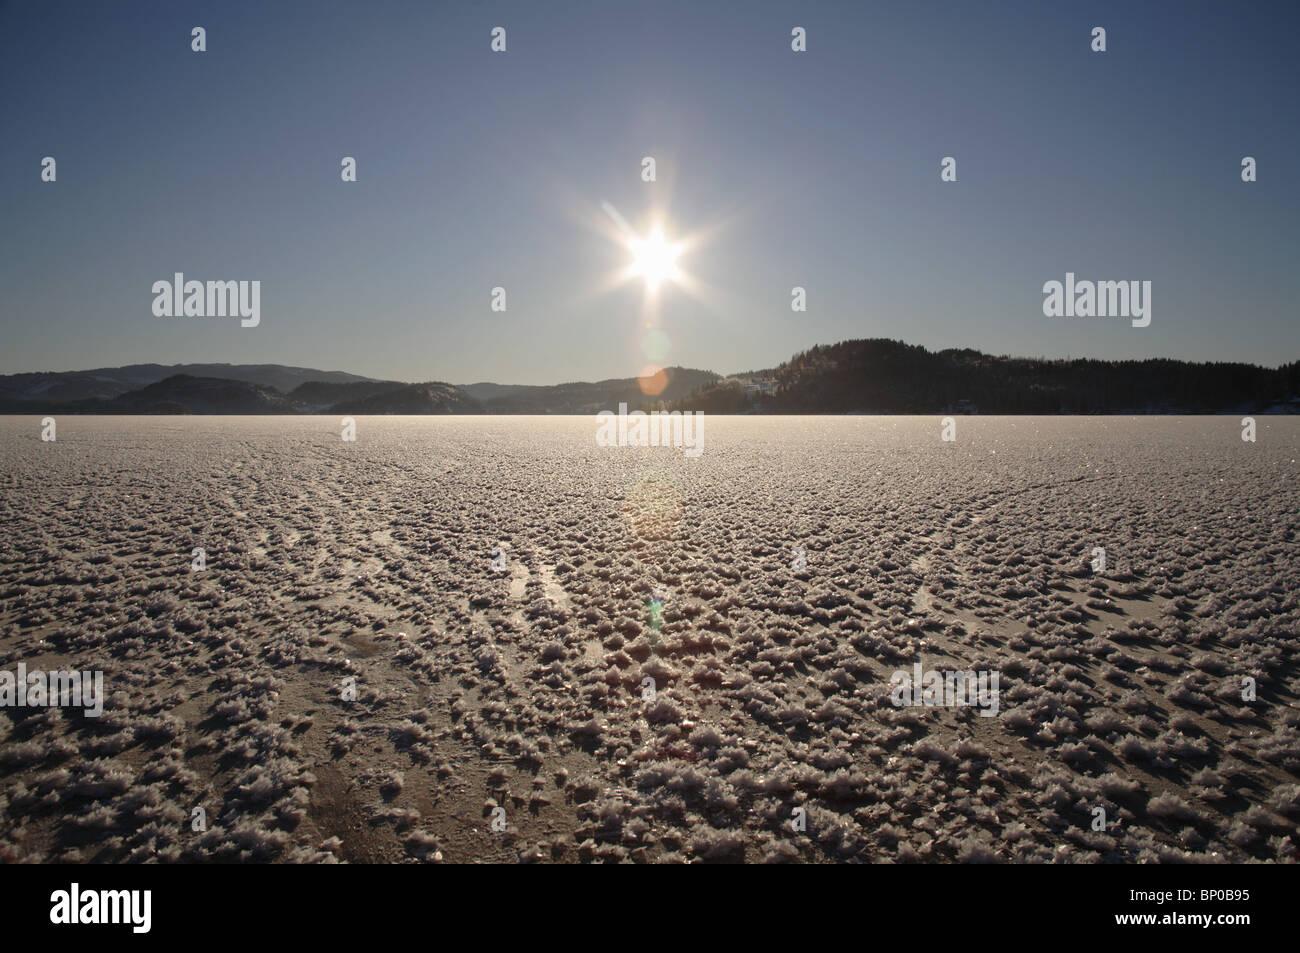 Zugefrorenen See, Sonne tief am Horizont Stockbild